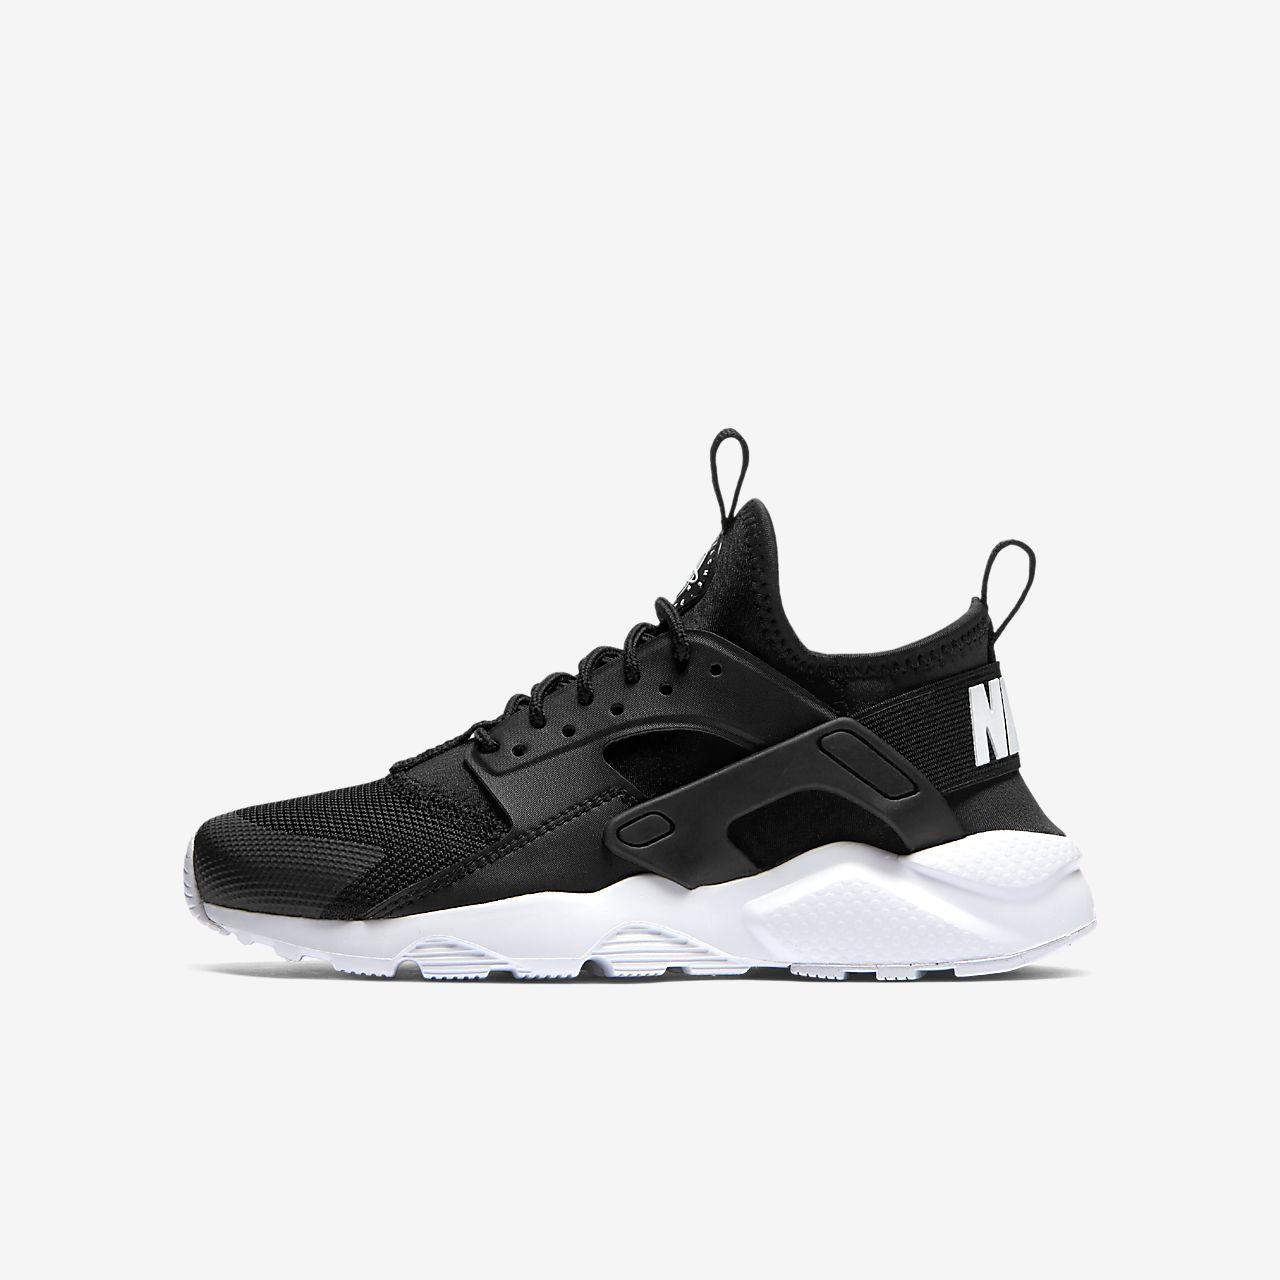 online retailer d488d 52959 ... Sko Nike Air Huarache Ultra för ungdom